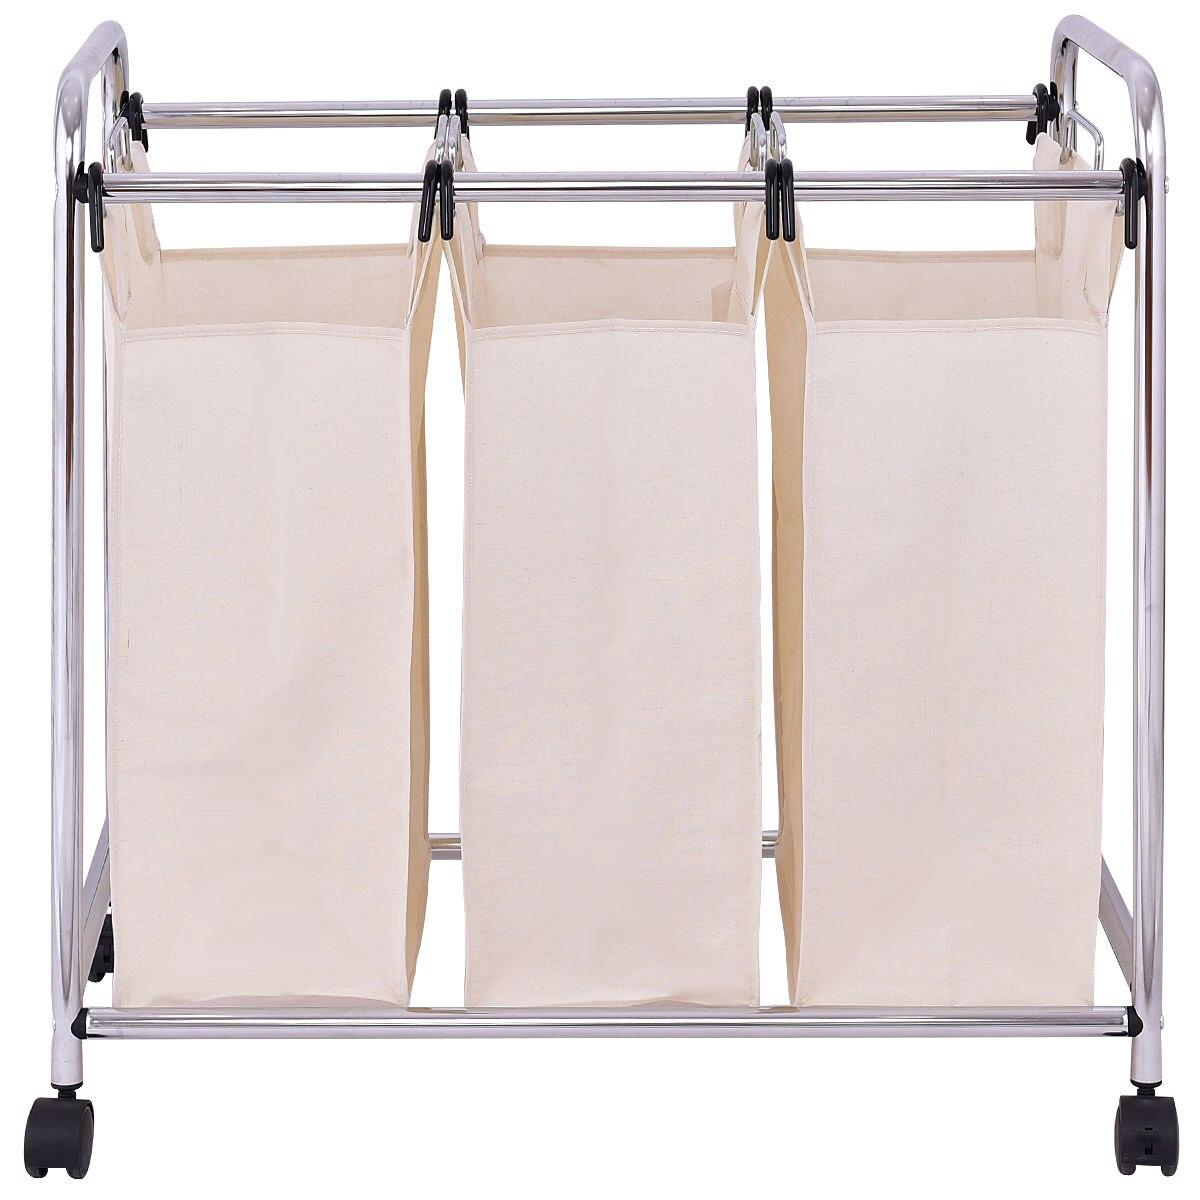 Goplus Laundry Cart Basket Triple Bag Sorter Portable Bathroom Hamper Bins Rolling Dirty Clothes Storage HW55257